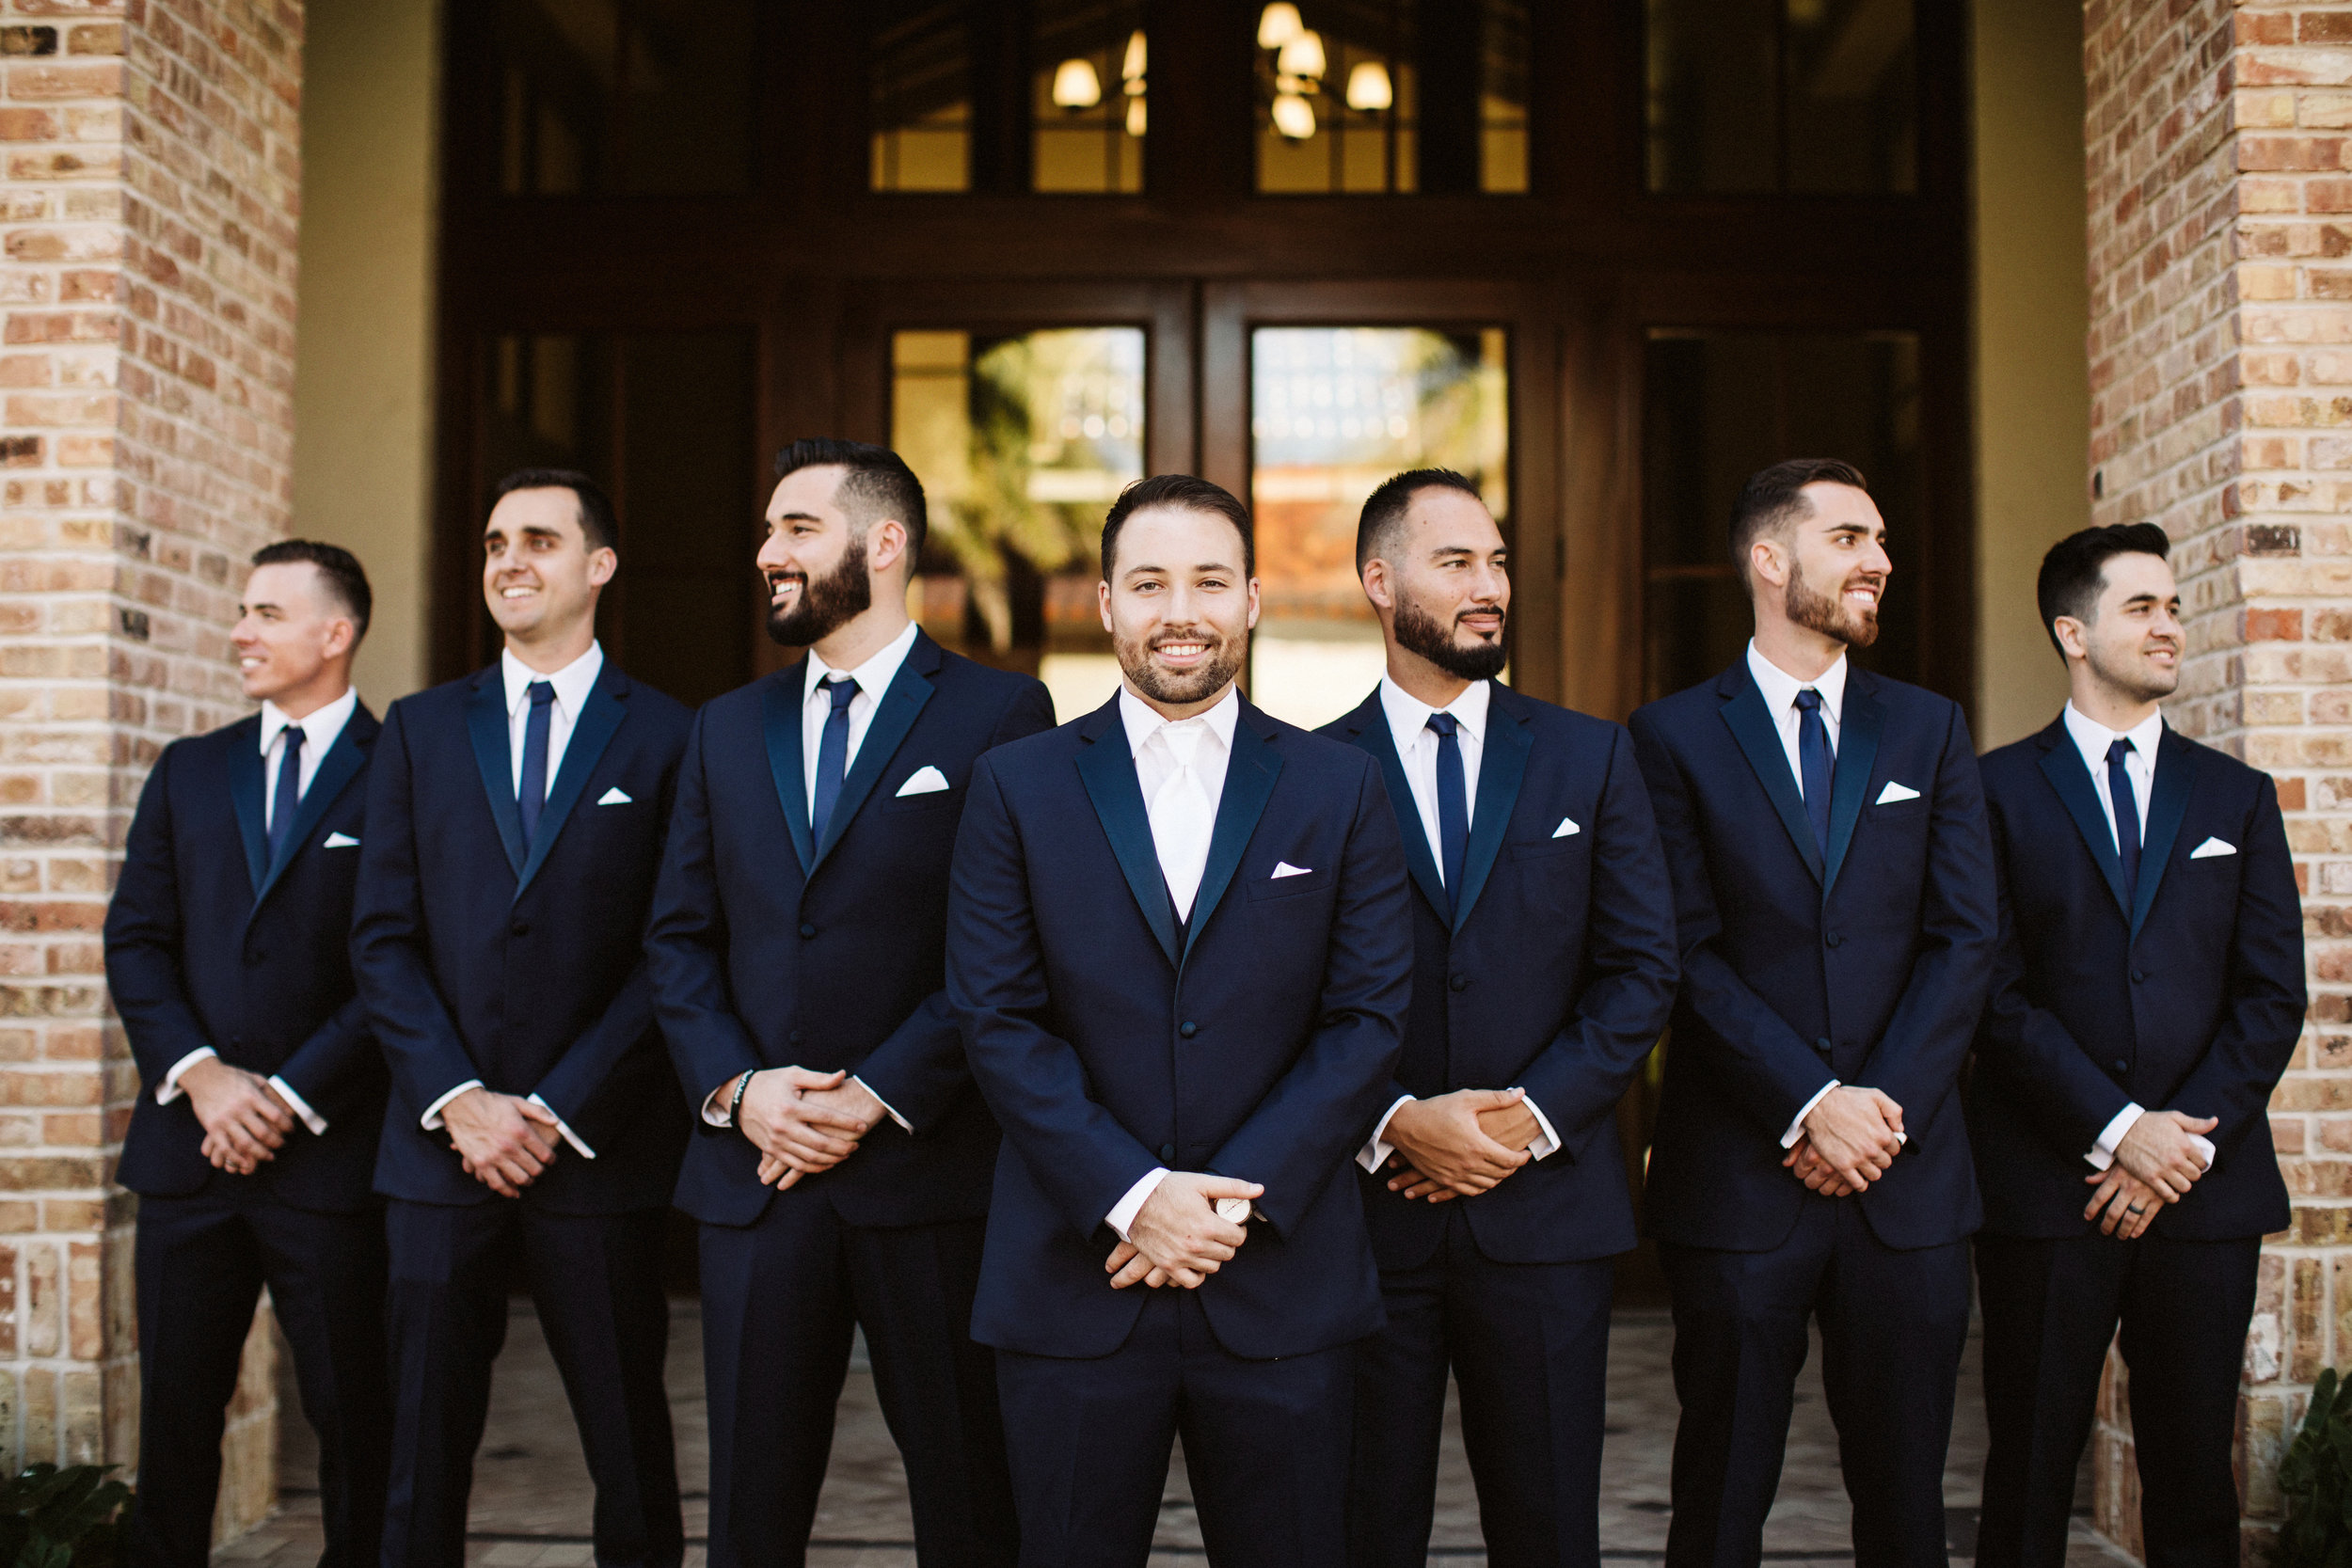 rachel-and-david-scott-wedding-139.jpg